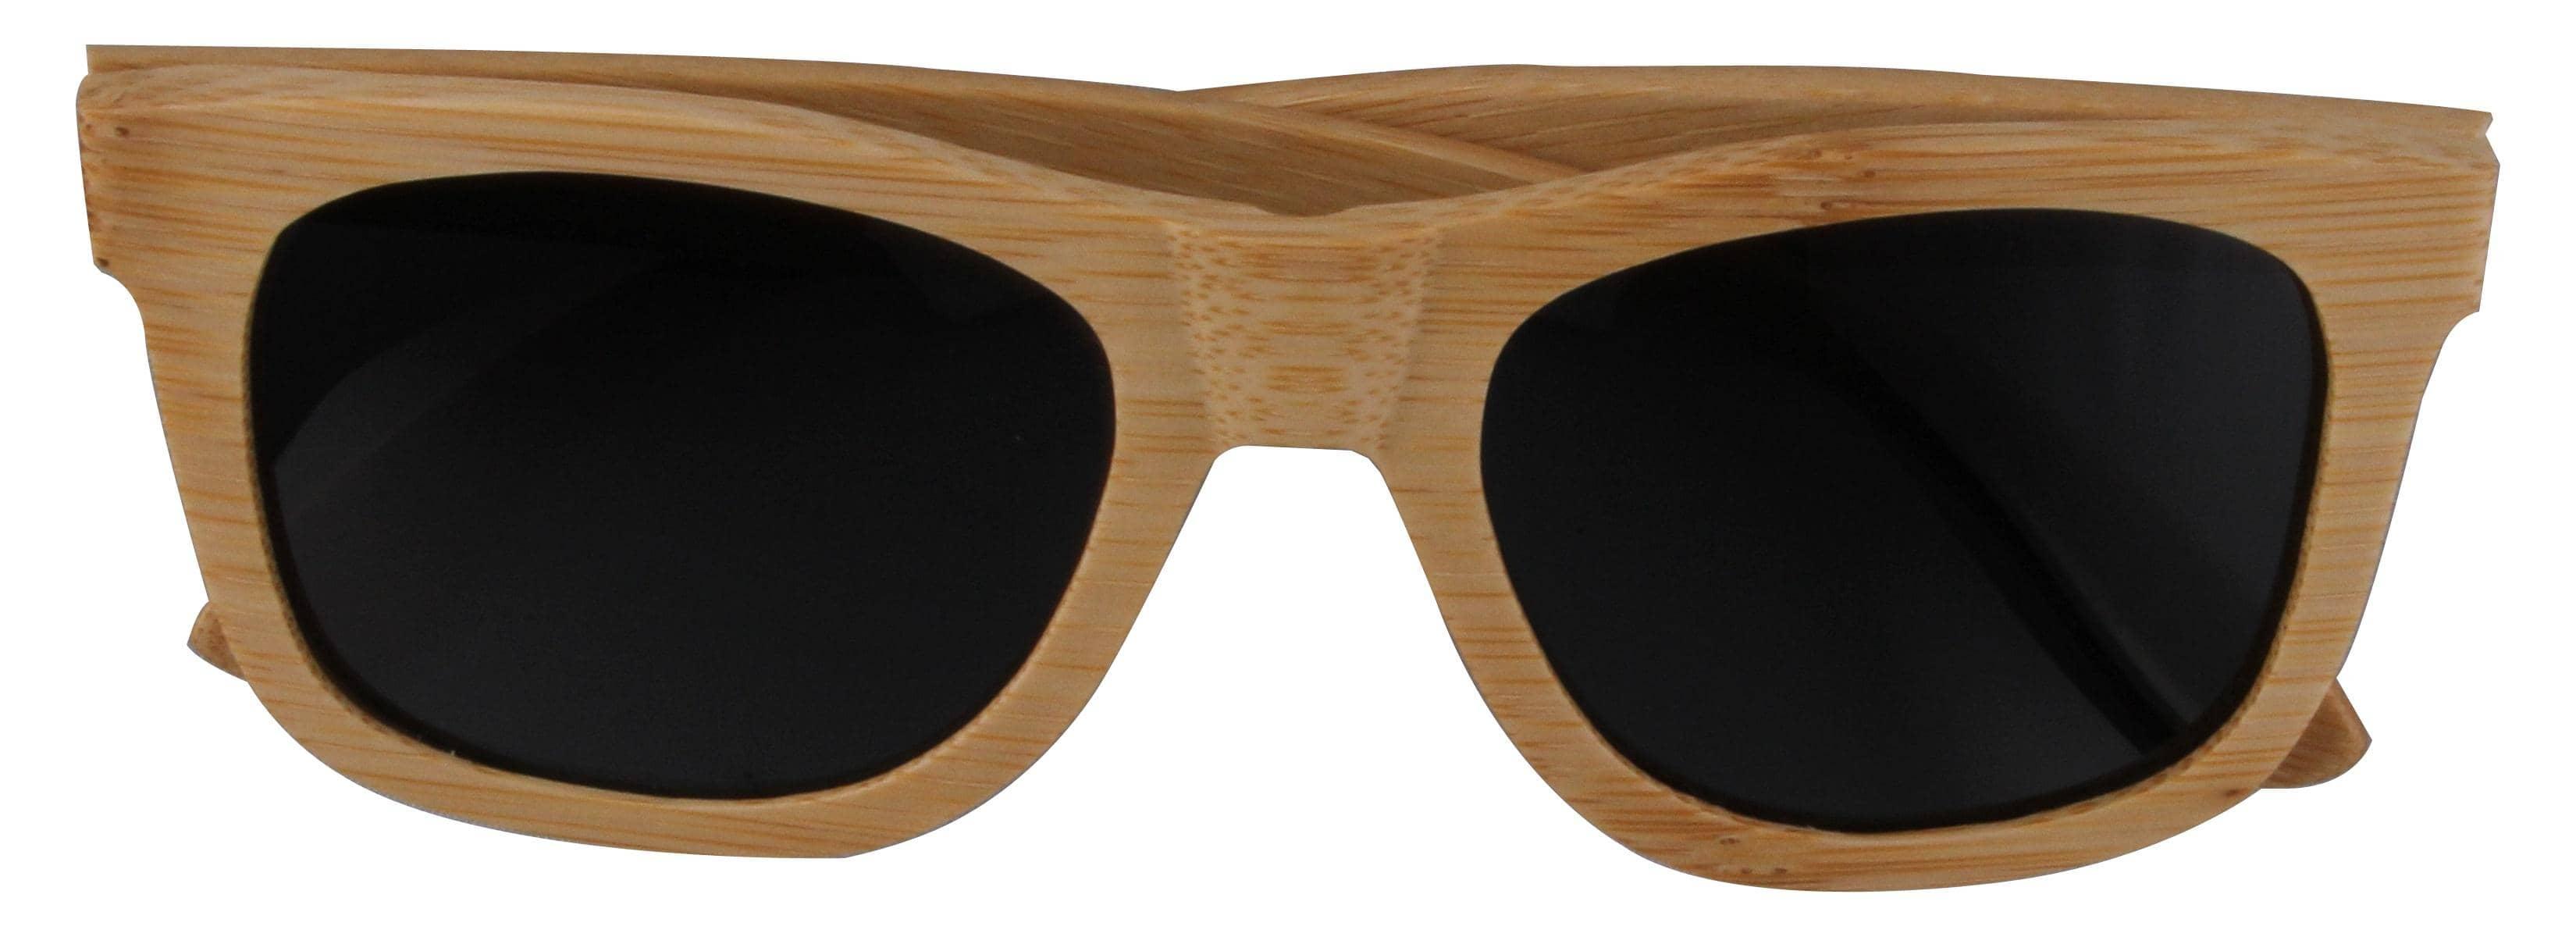 5one® Bamboo Grey Bamboe hout Wayfarer Zonnebril - Grijze lens